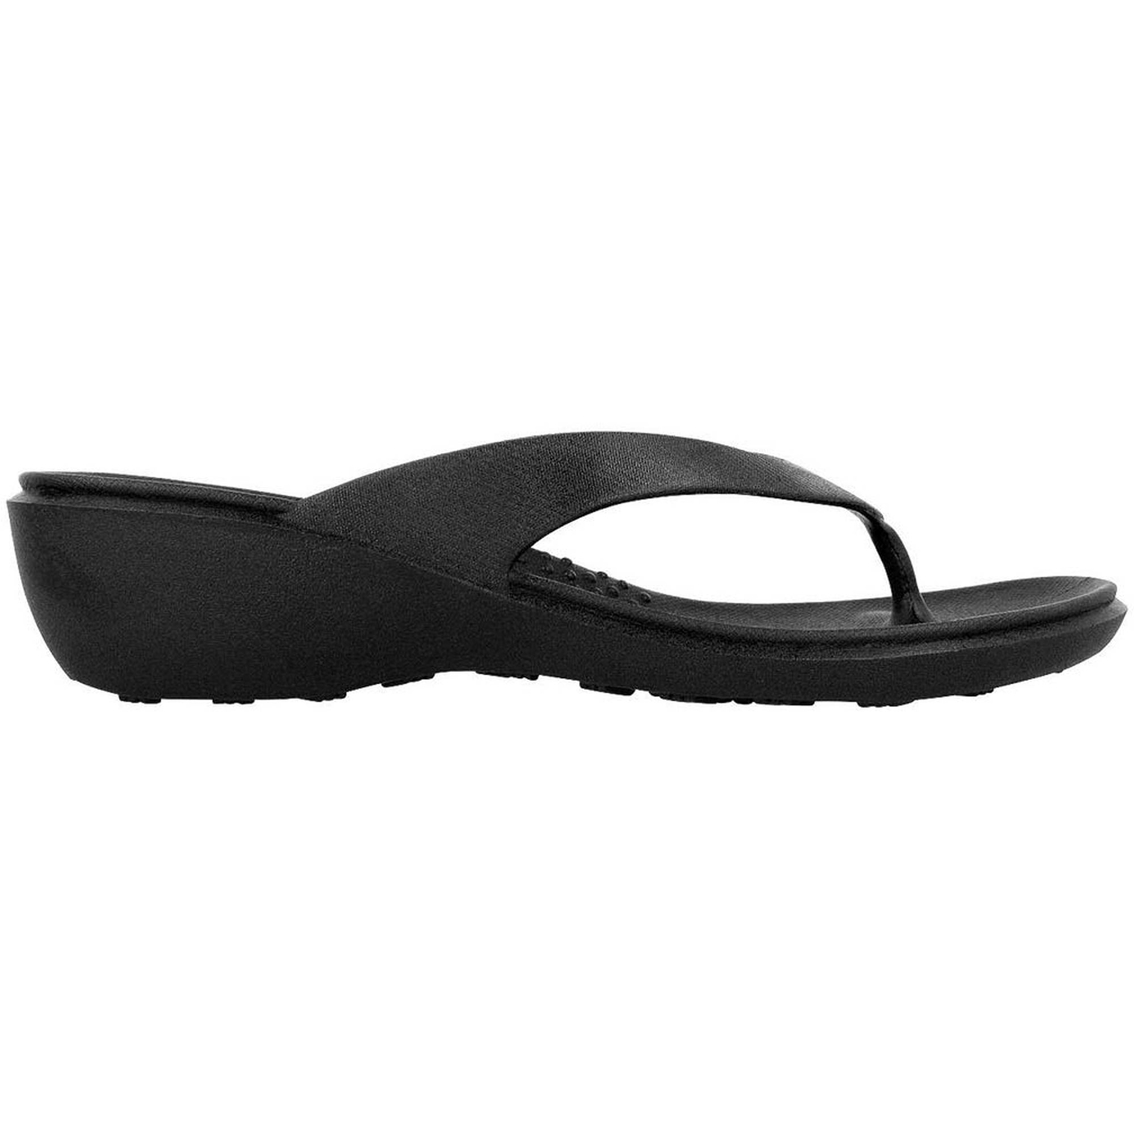 70ad9d1d86a2 Okabashi Women s Splash Flip Flop